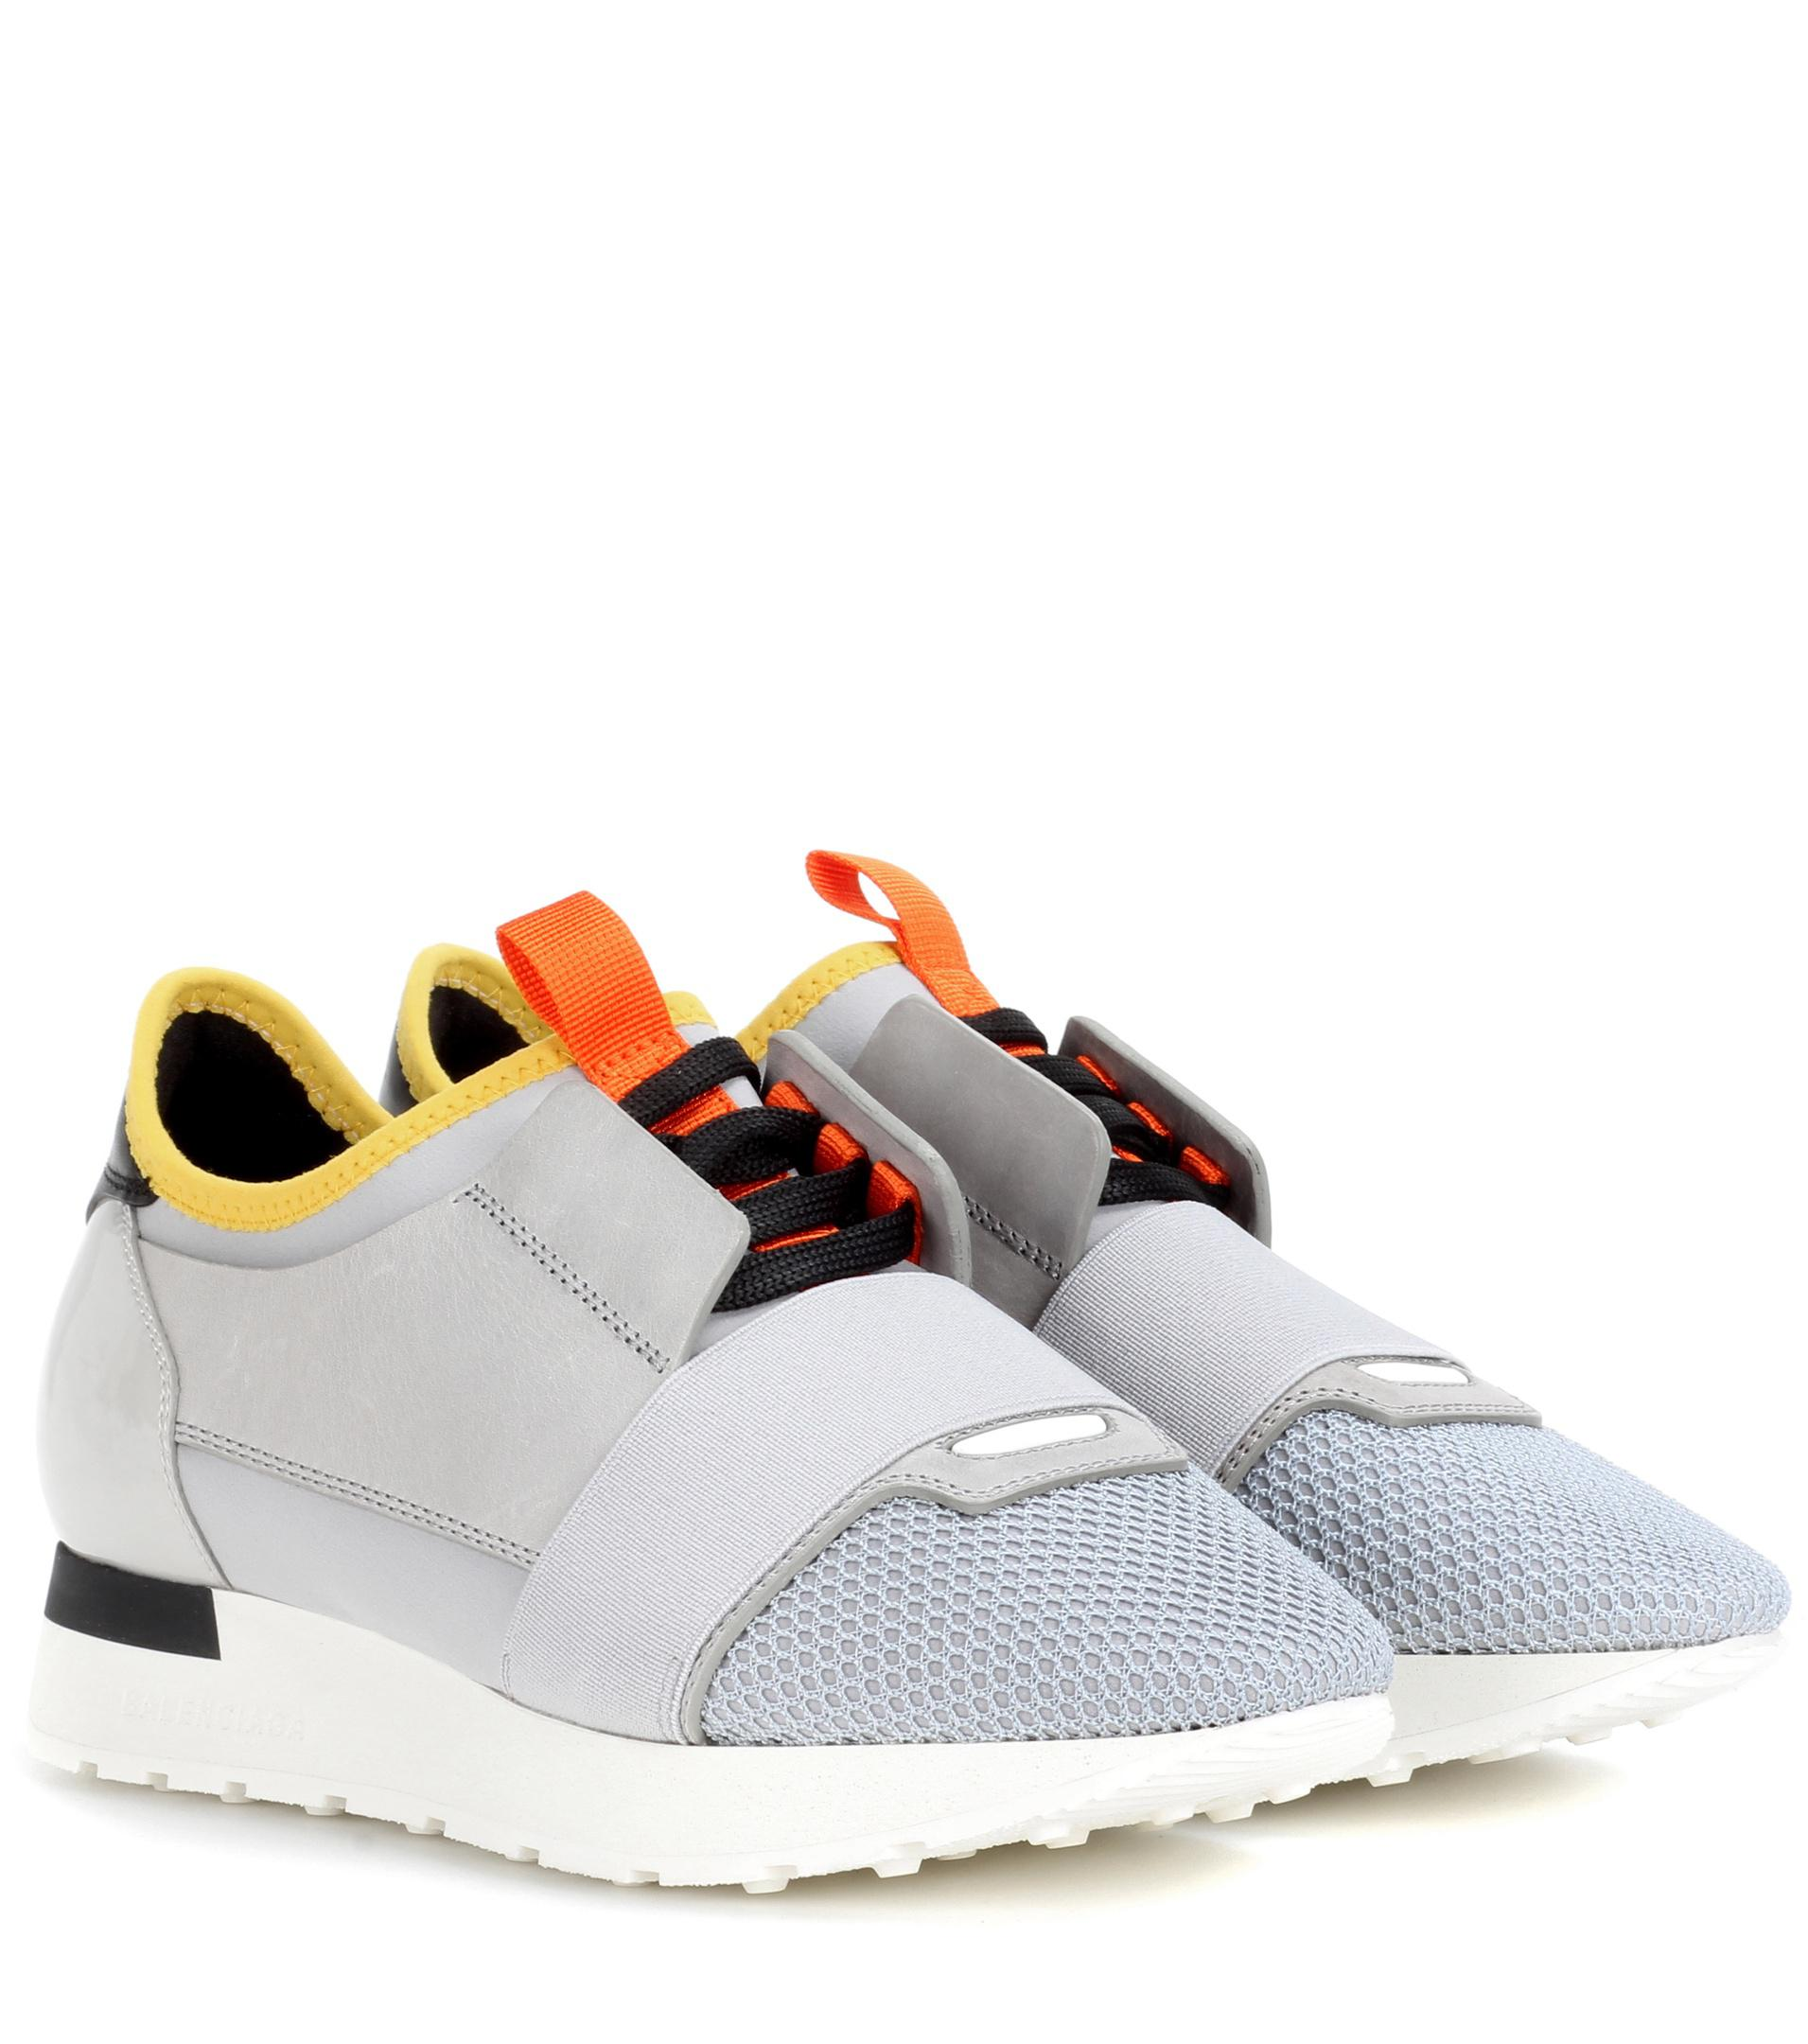 Balenciaga Race Runner Sneakers in Grey